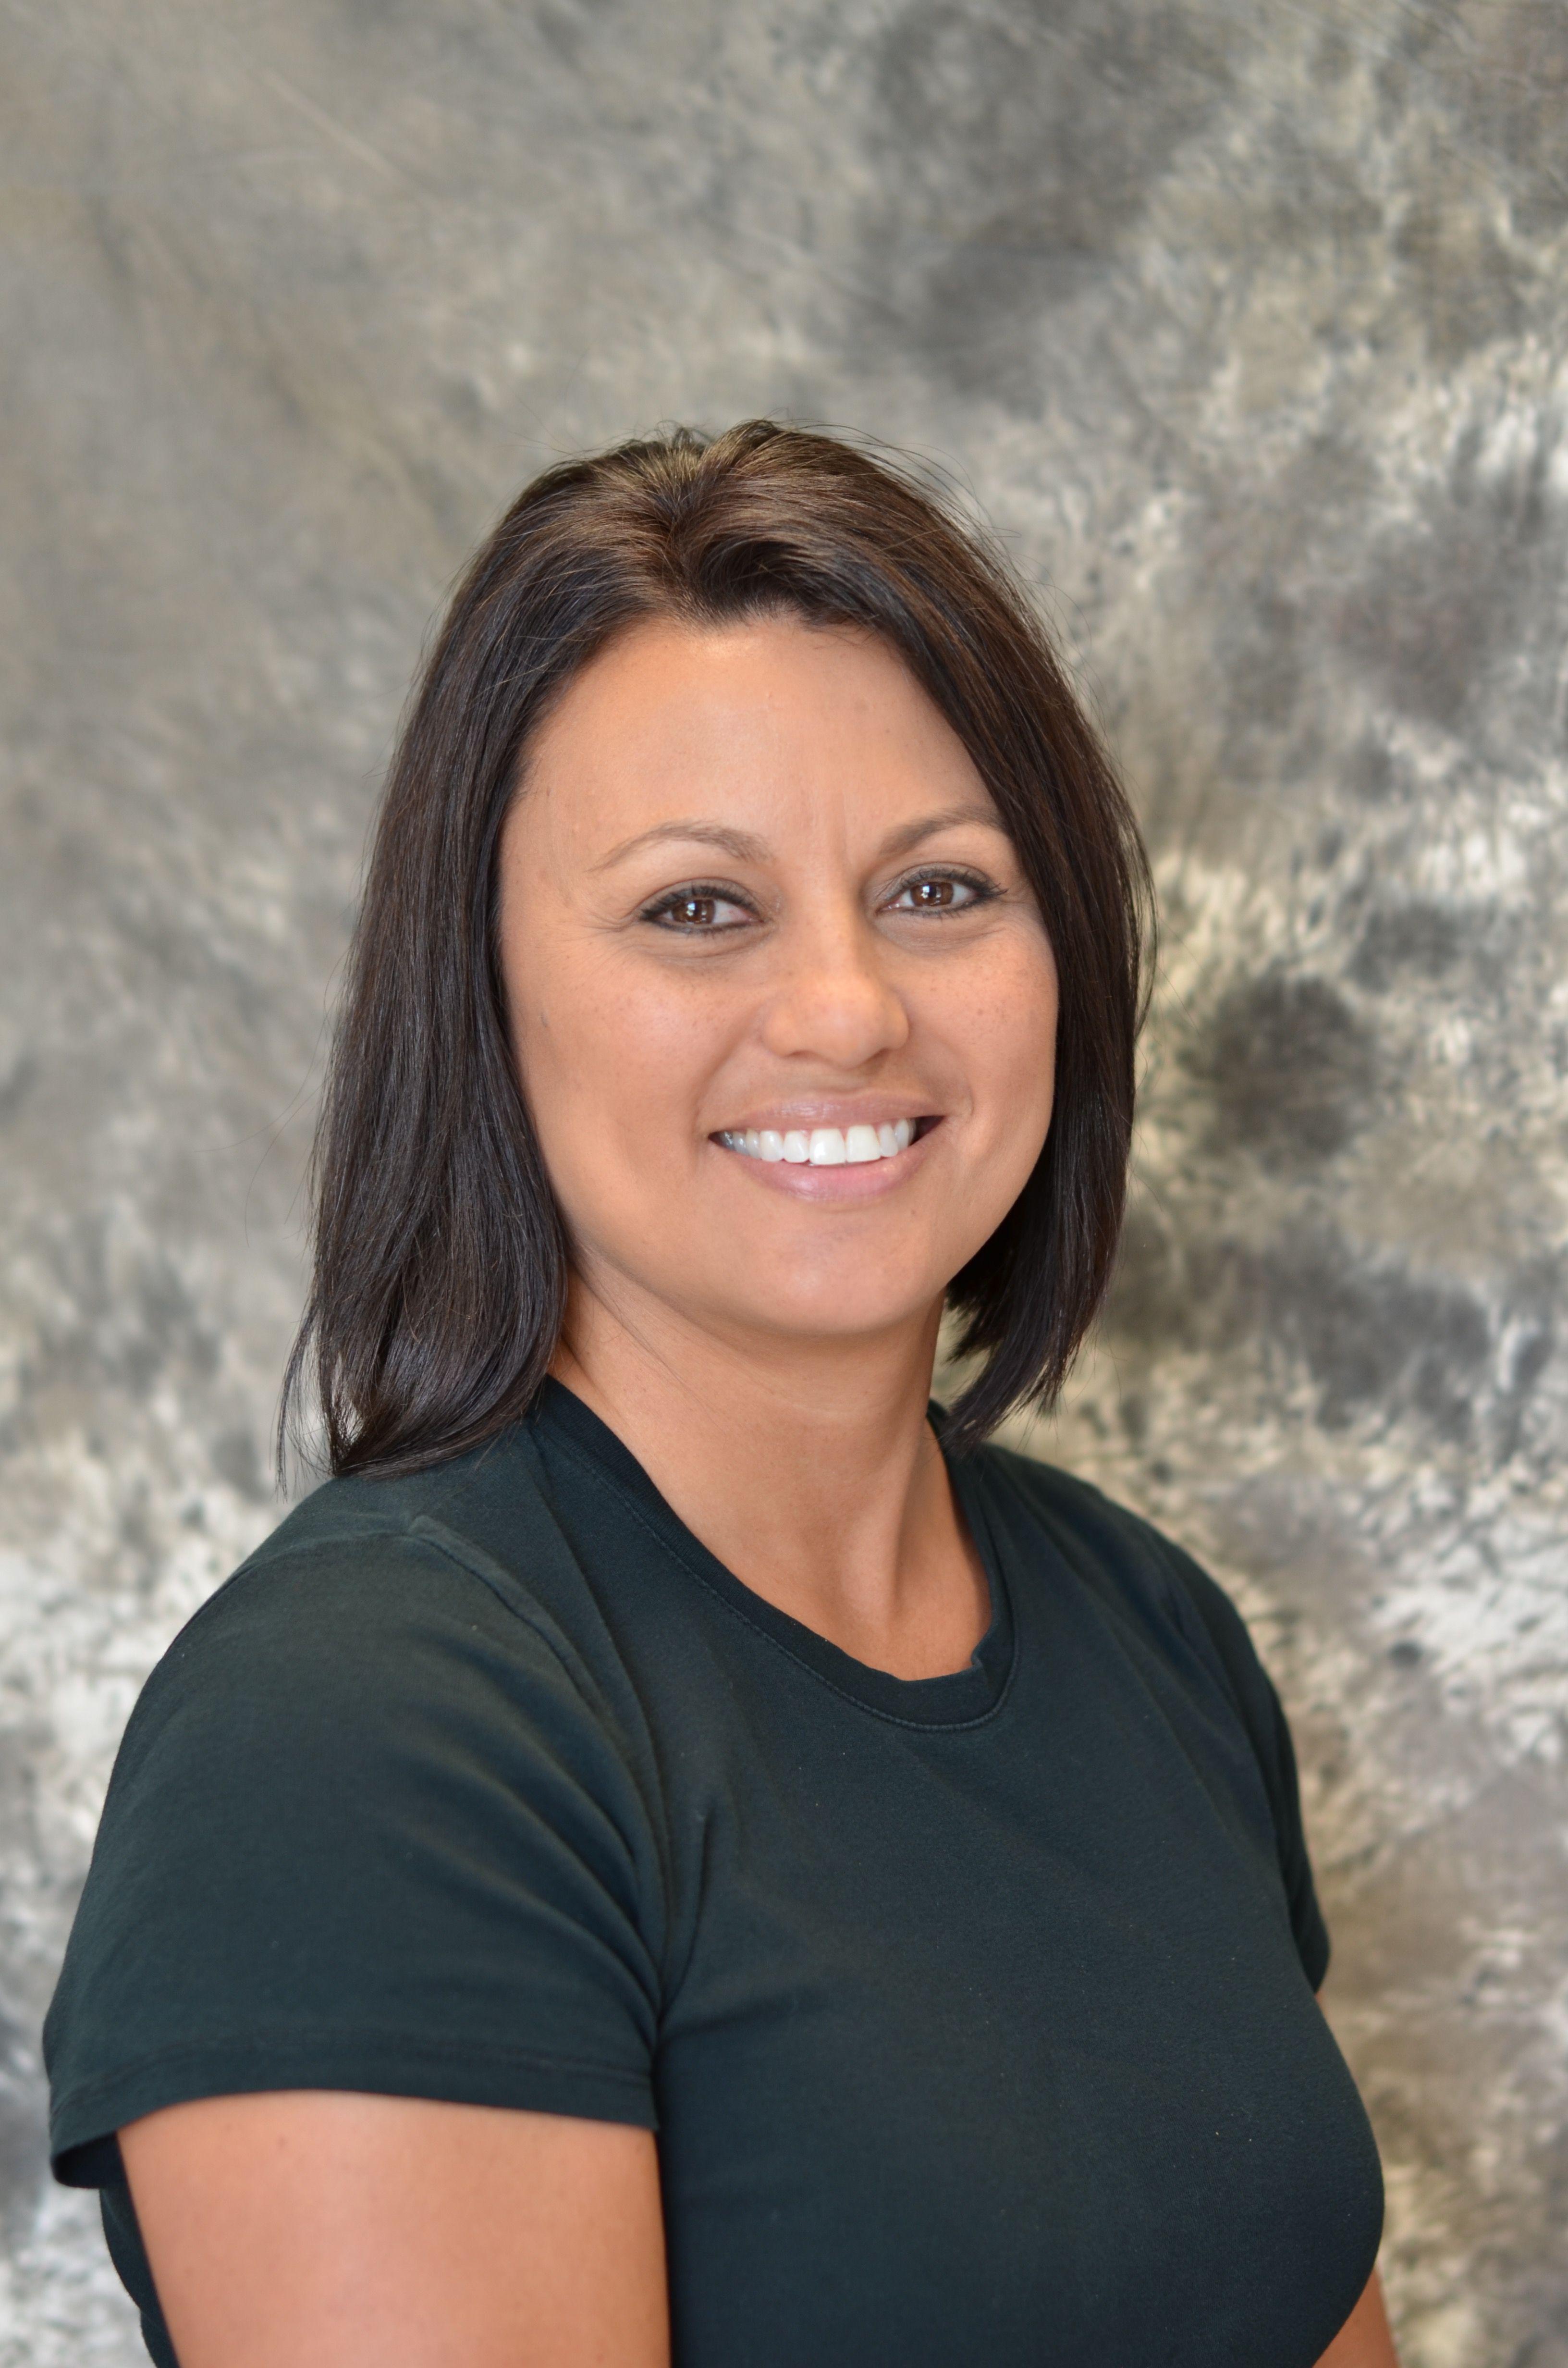 Emily Dental Hygienist teamgfd calvertcountydentist